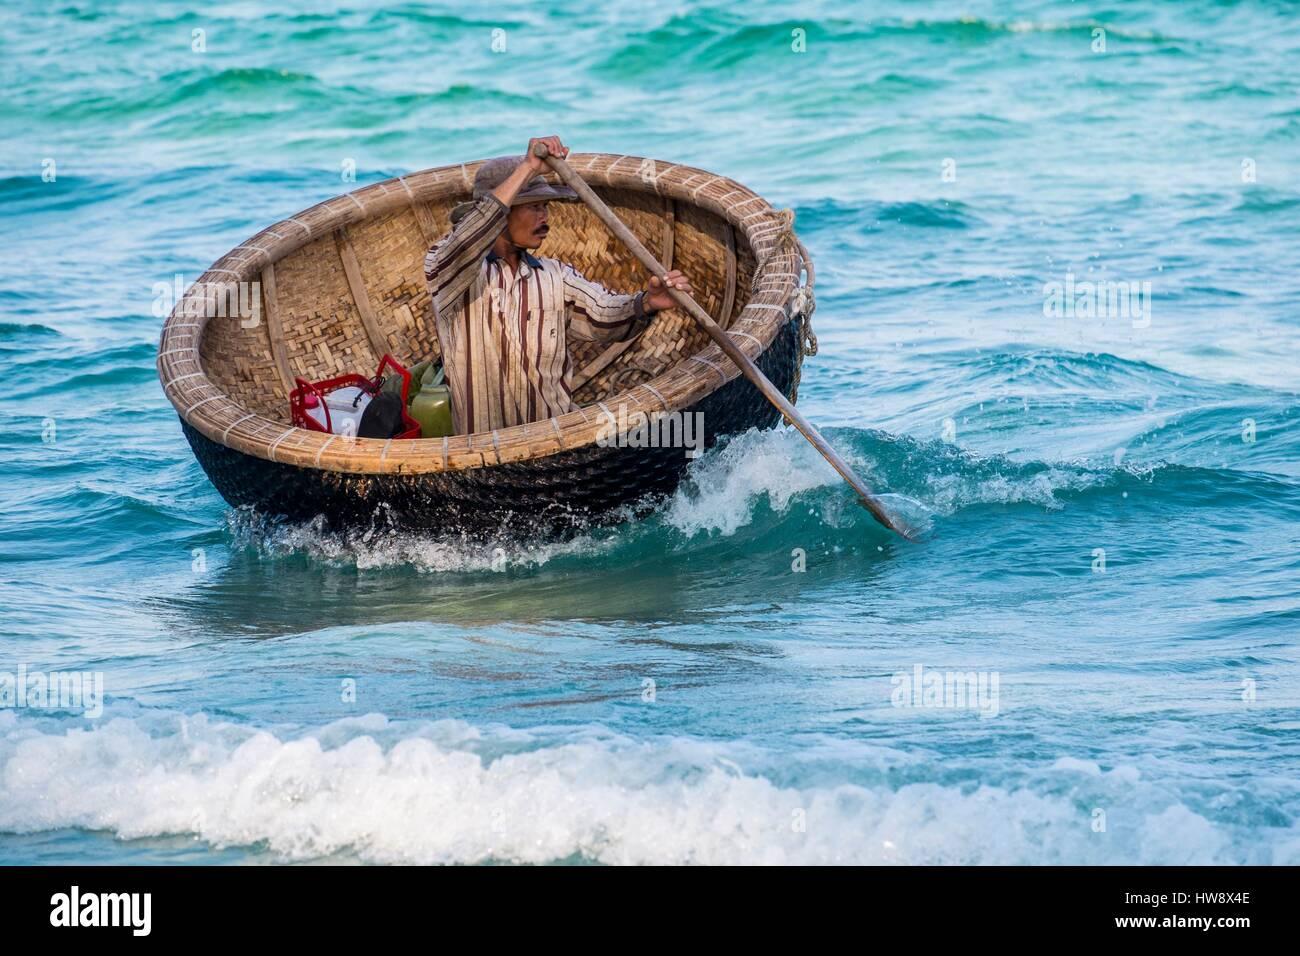 Vietnam, Khanh Hoa province, near Nha Trang, the Doc Let beach - Stock Image